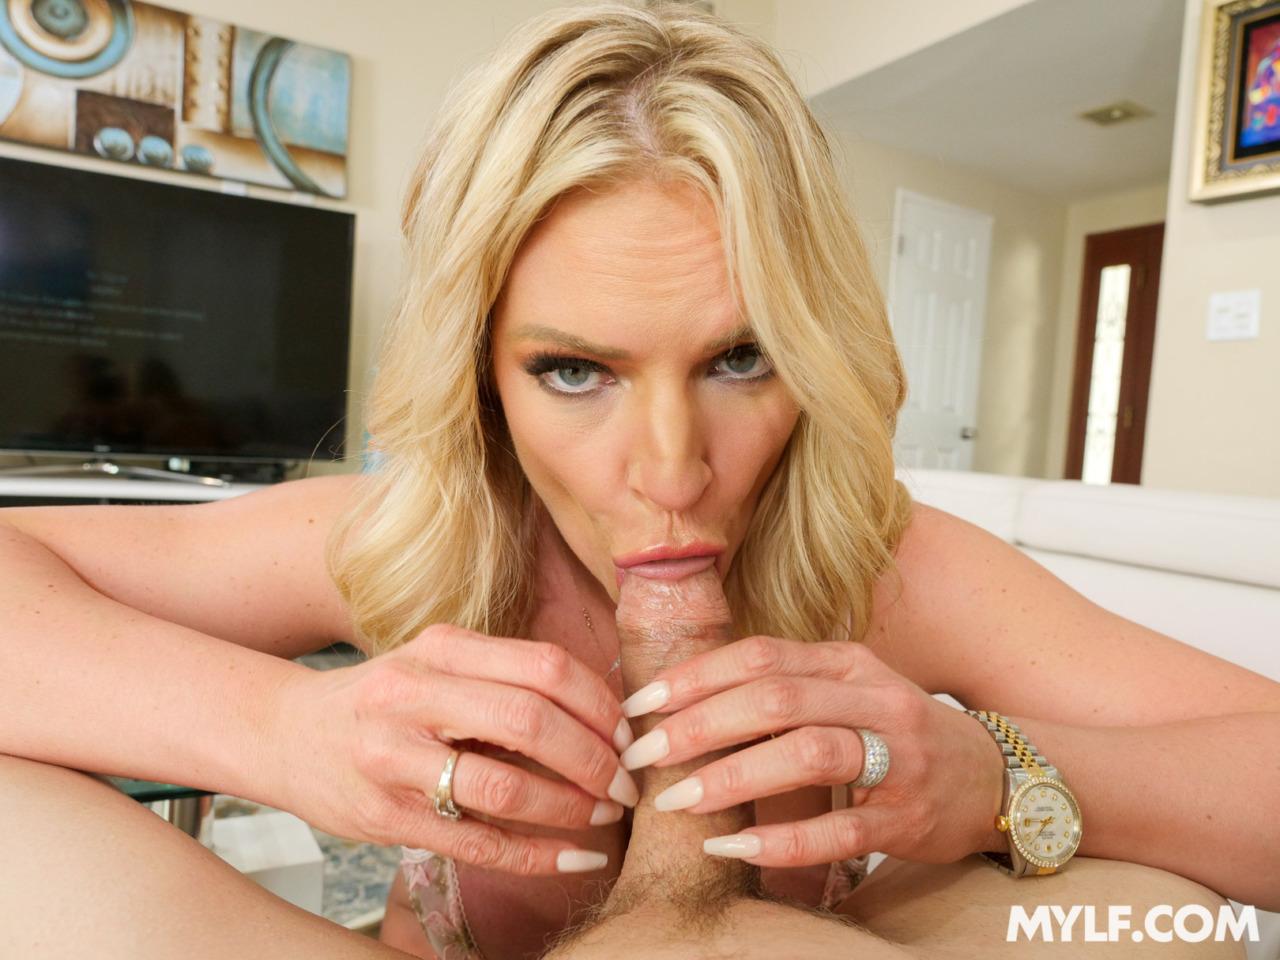 MYLF: BabeSource.com: Rachael Cavalli - 7